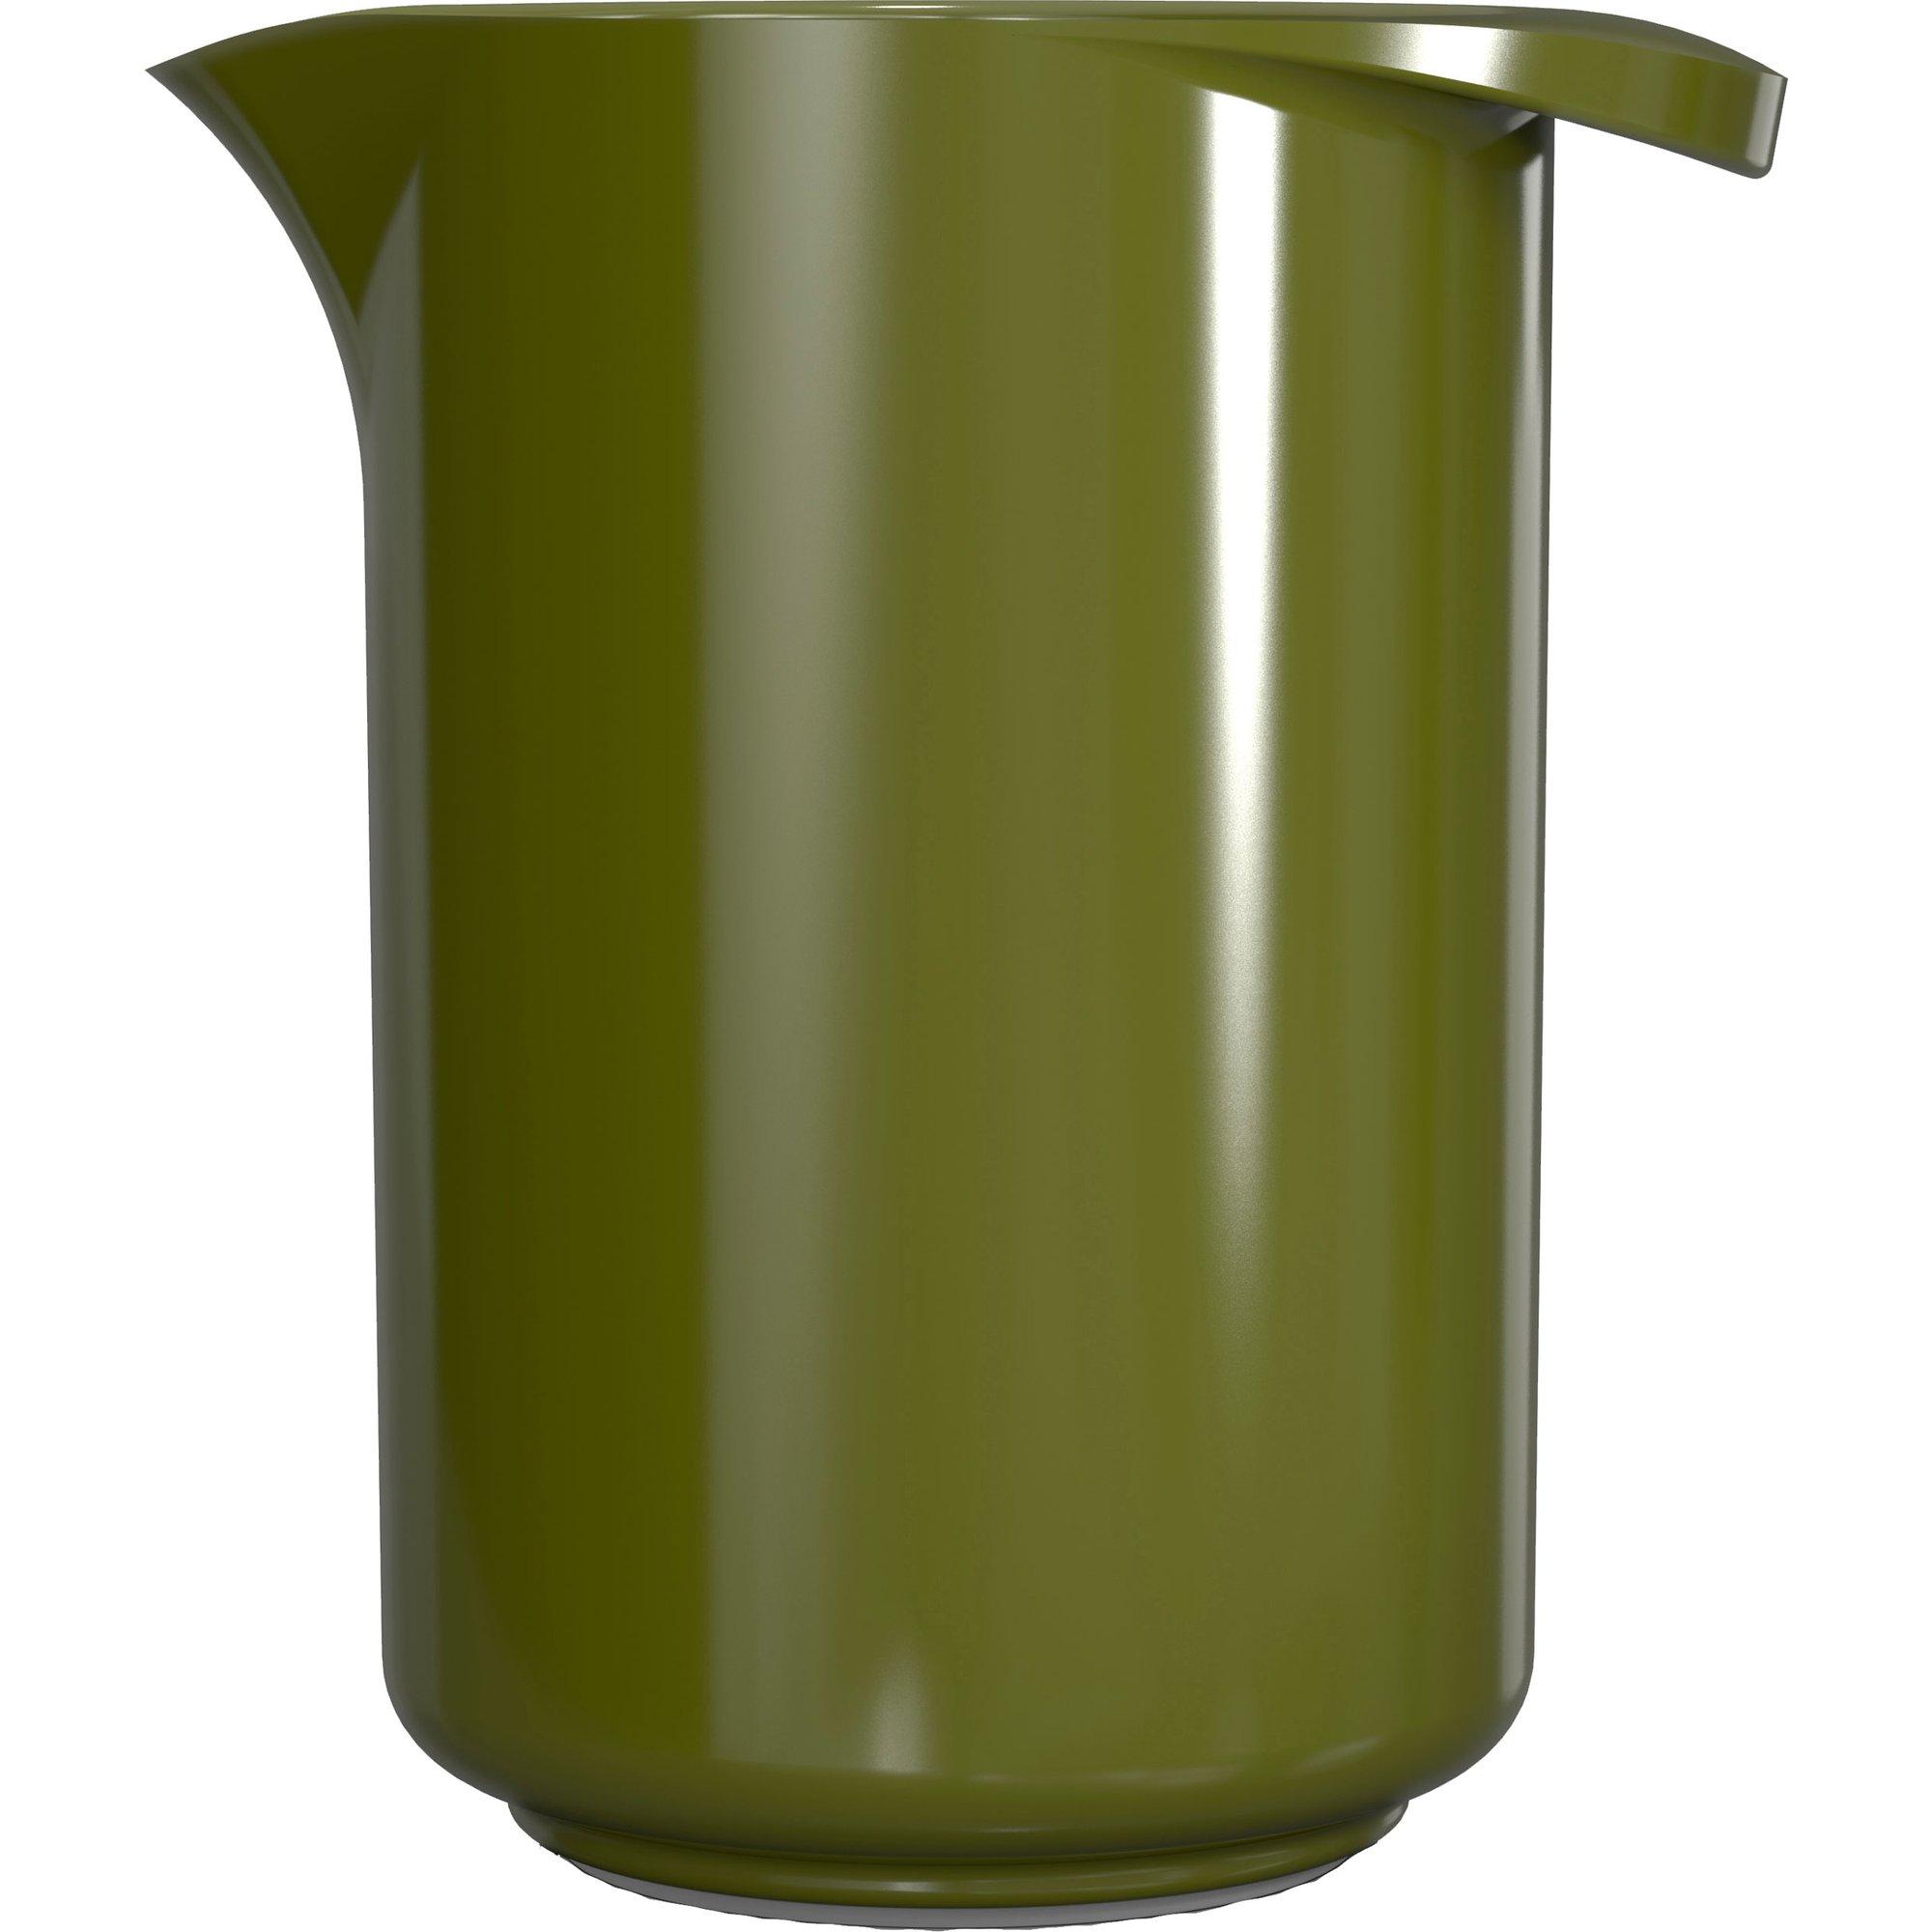 Rosti Mepal Mixkanna 1 liter olivgrön